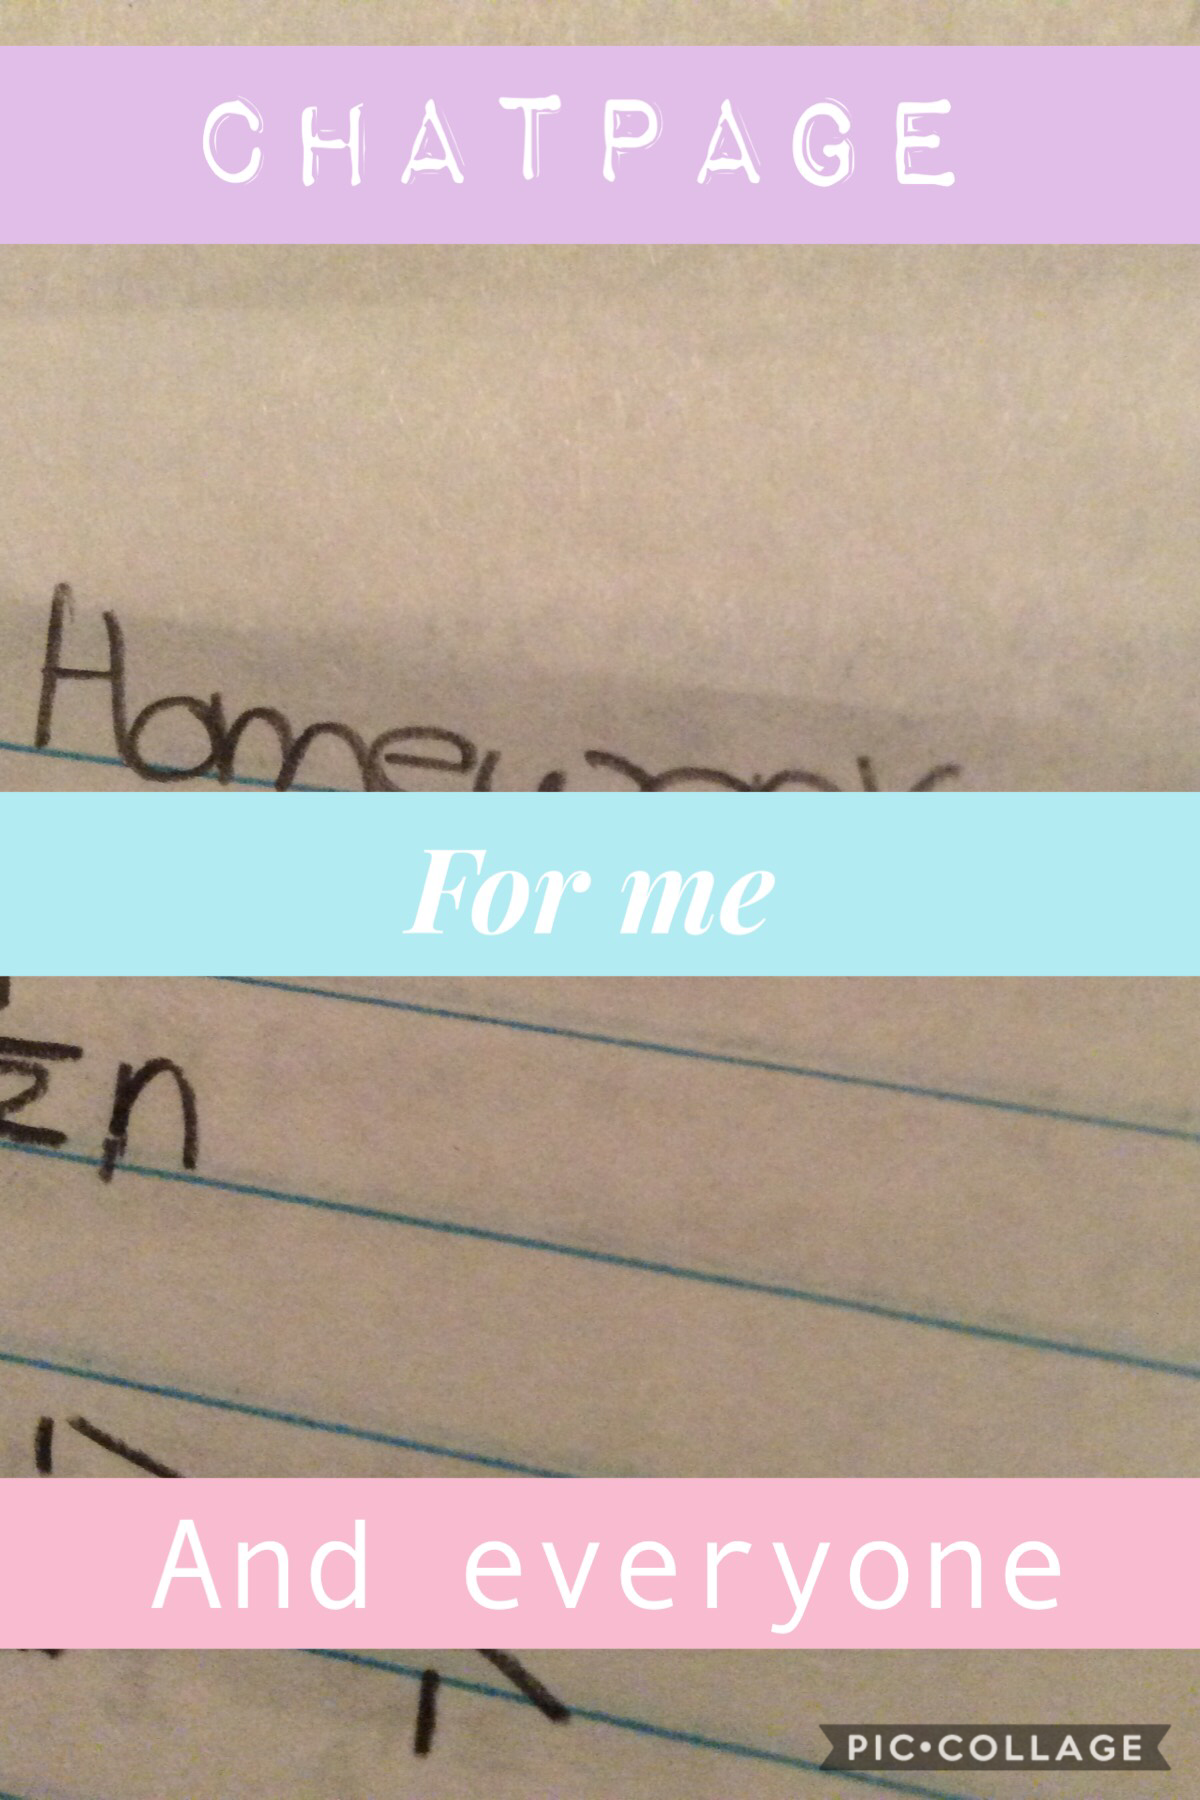 IHDK?😑 I'm a single pringle who just wants to talk☹️😭